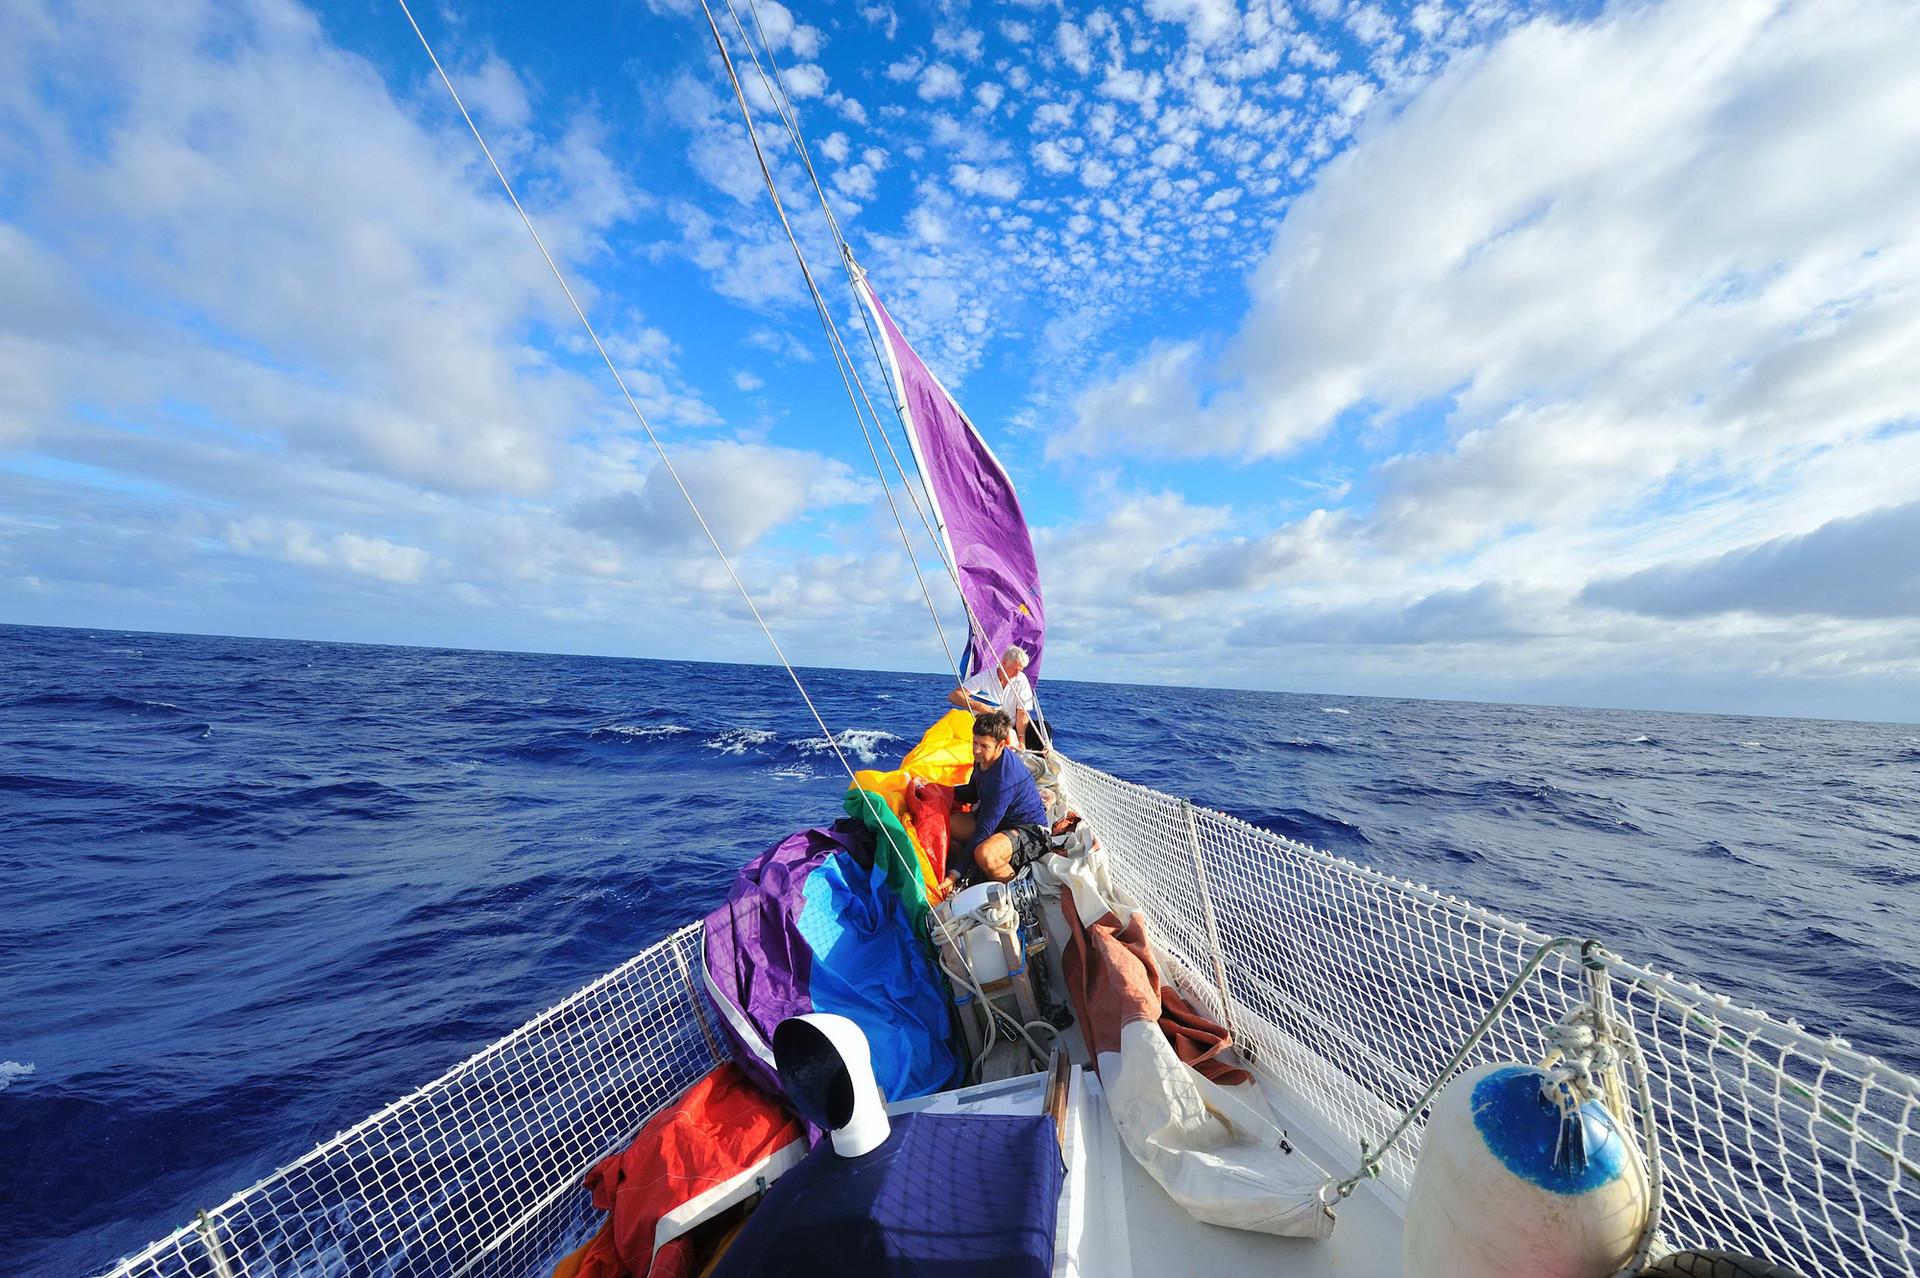 Bound for Palmerston Atoll